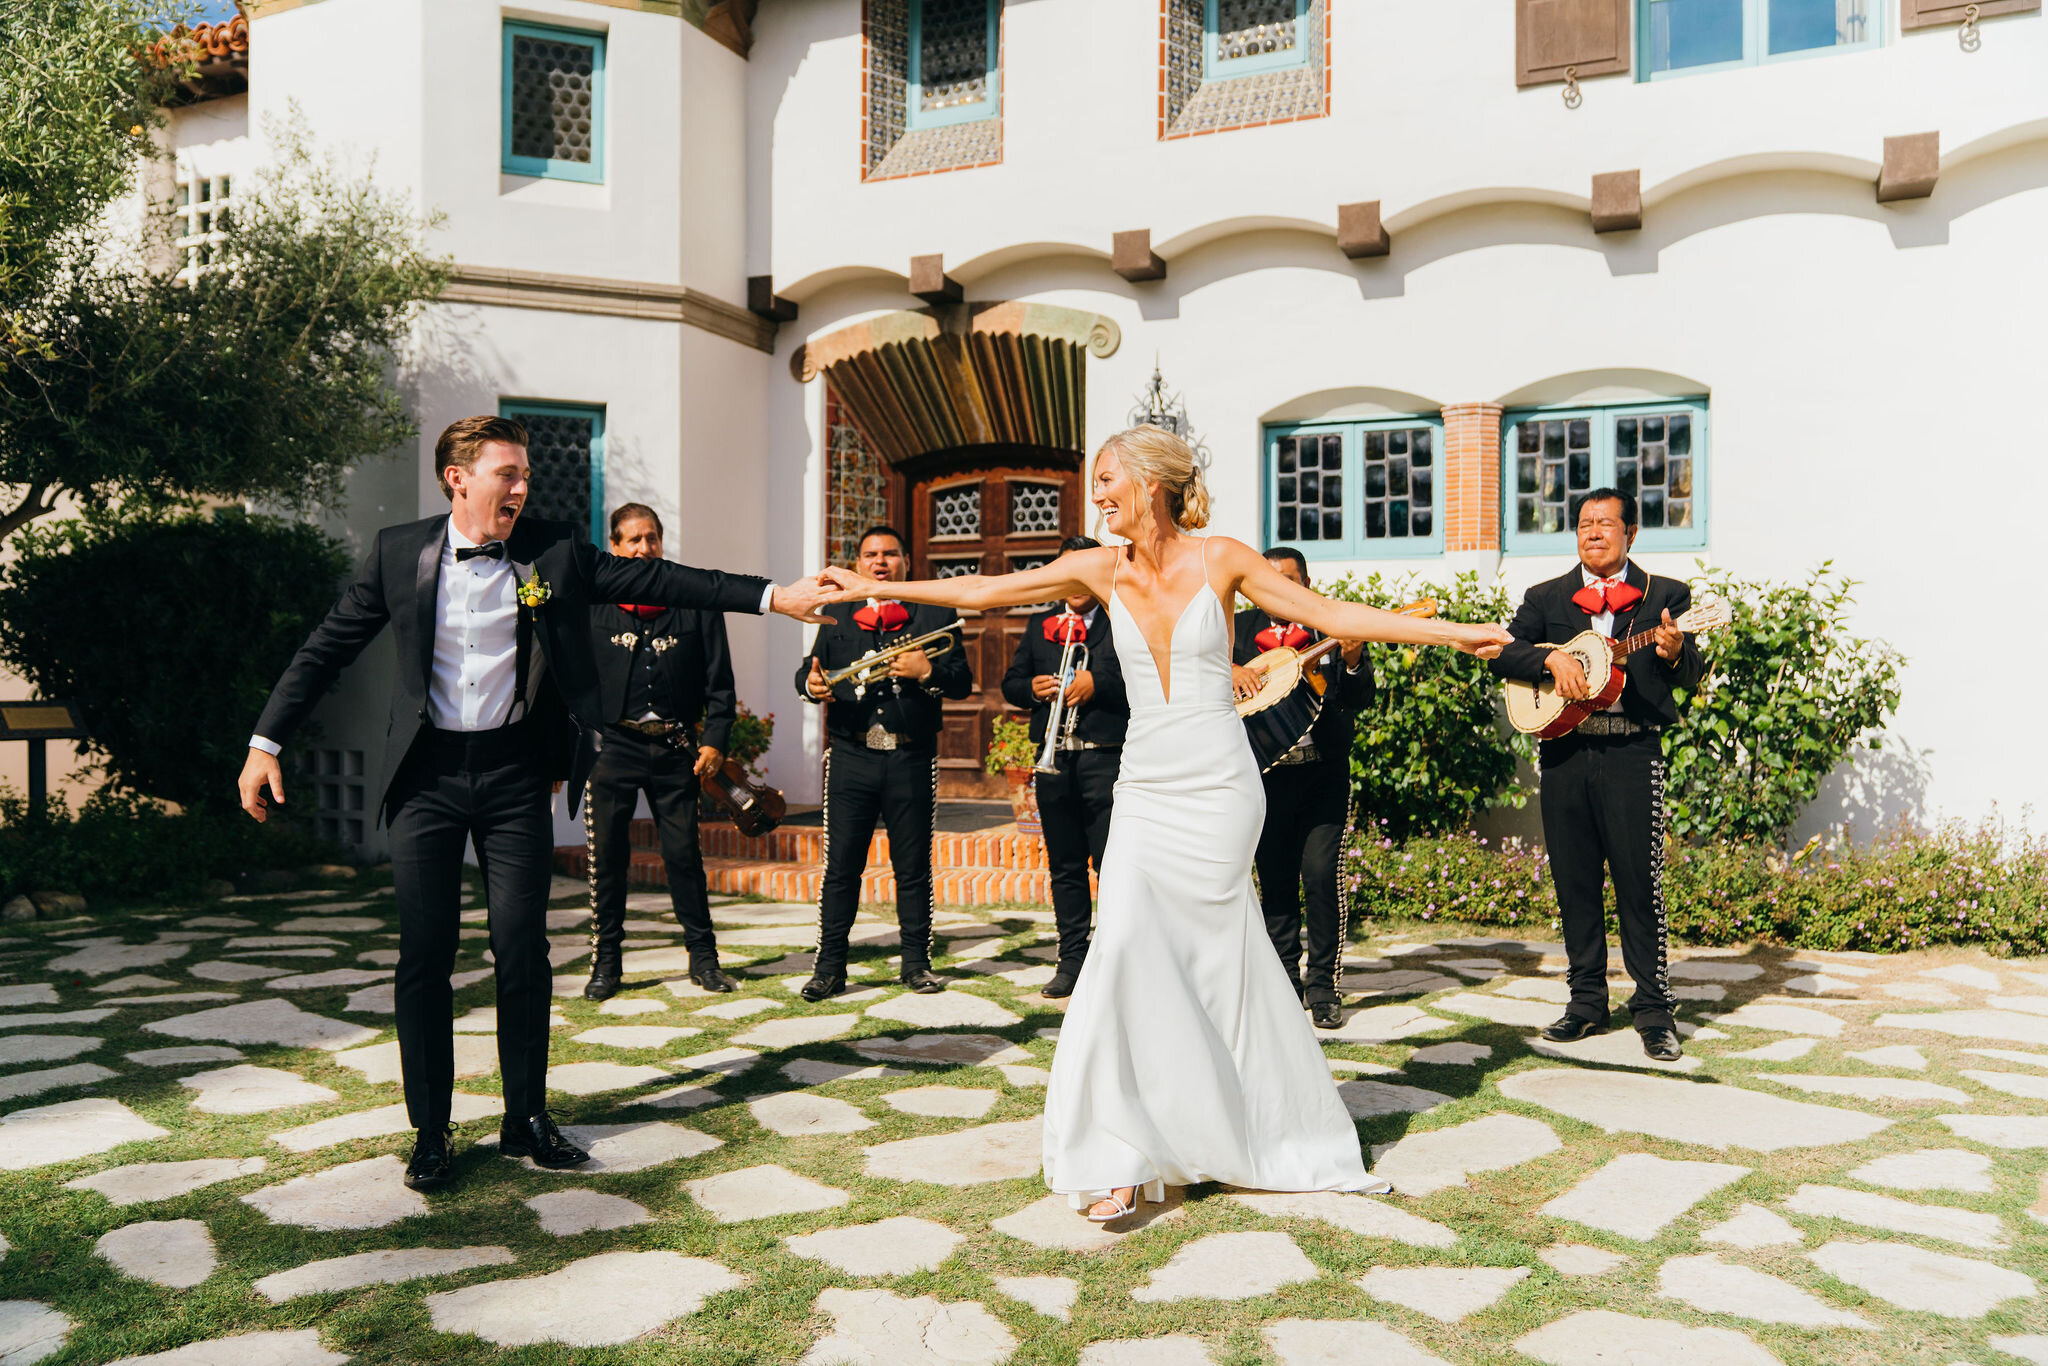 adamson-house-wedding-photography-108.jpg